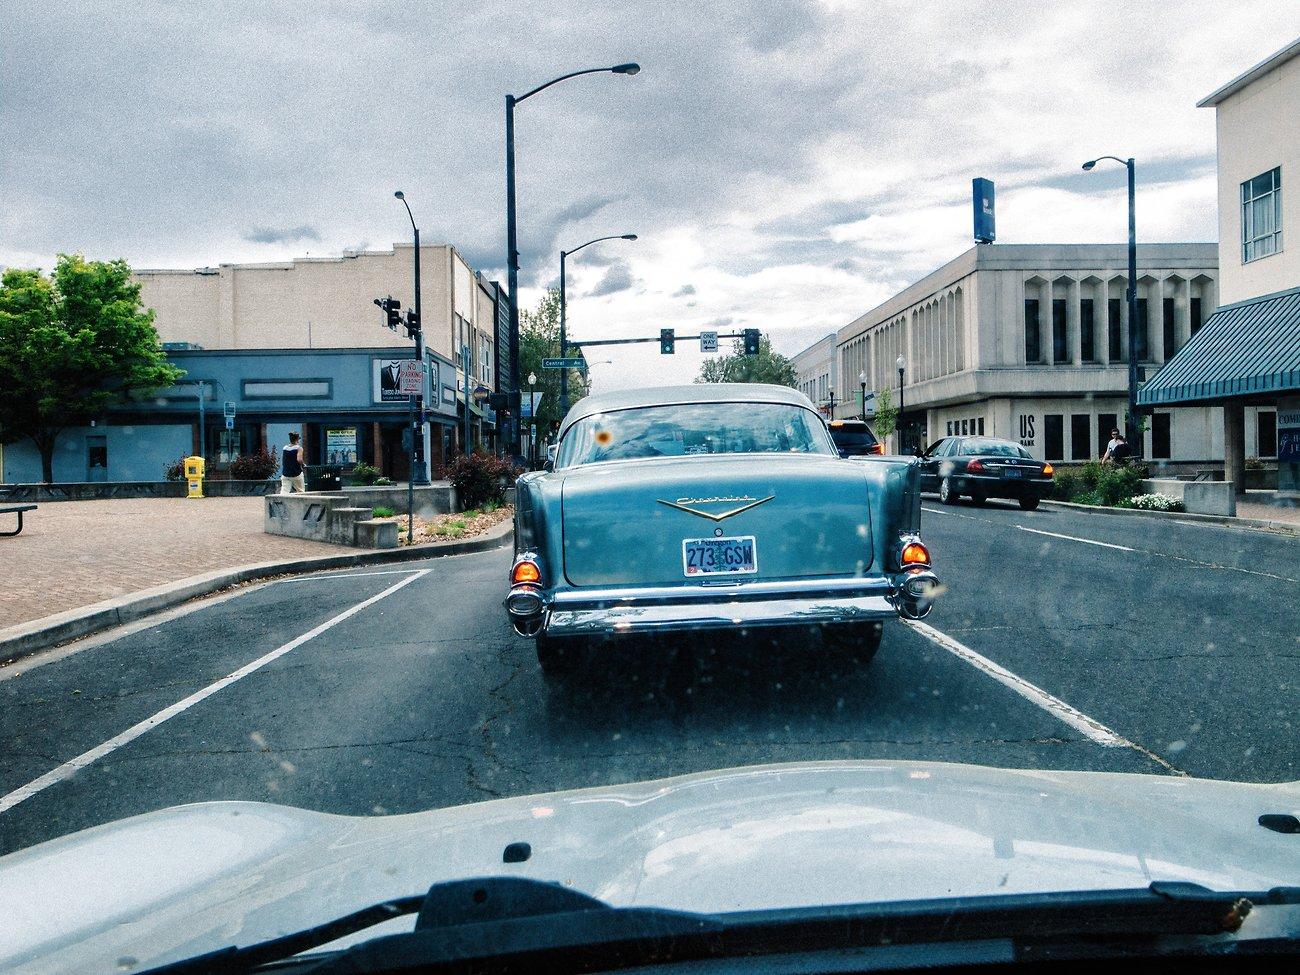 GRD_Cruising_downtown.jpg